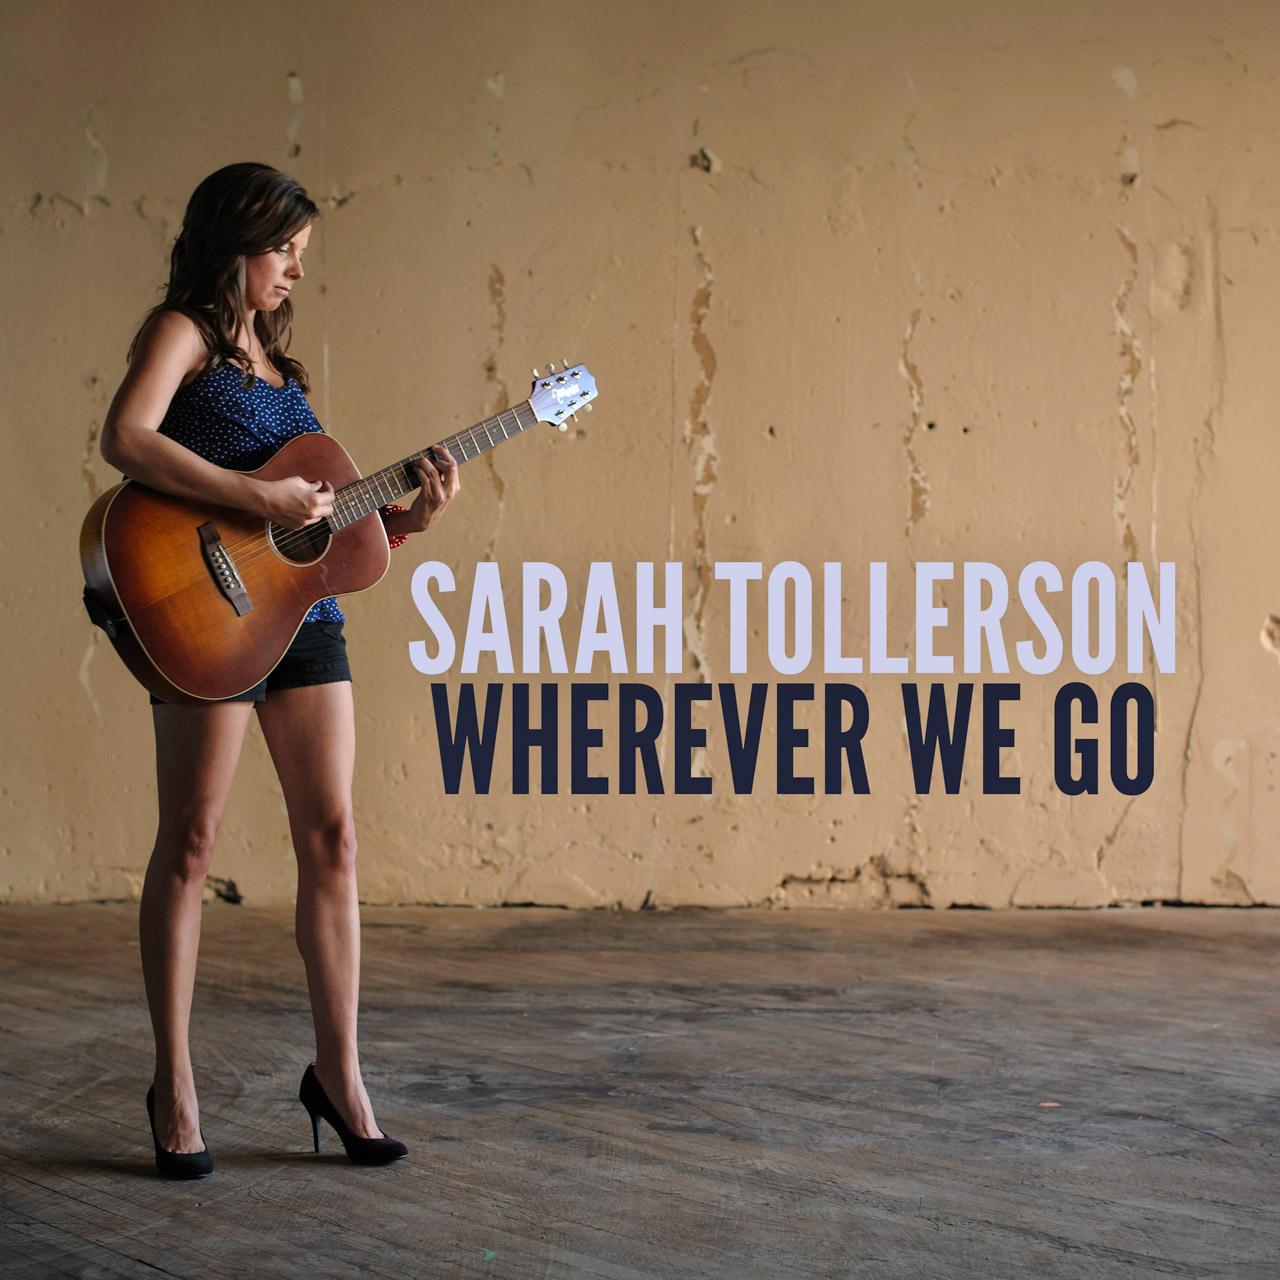 Sara Tollerson